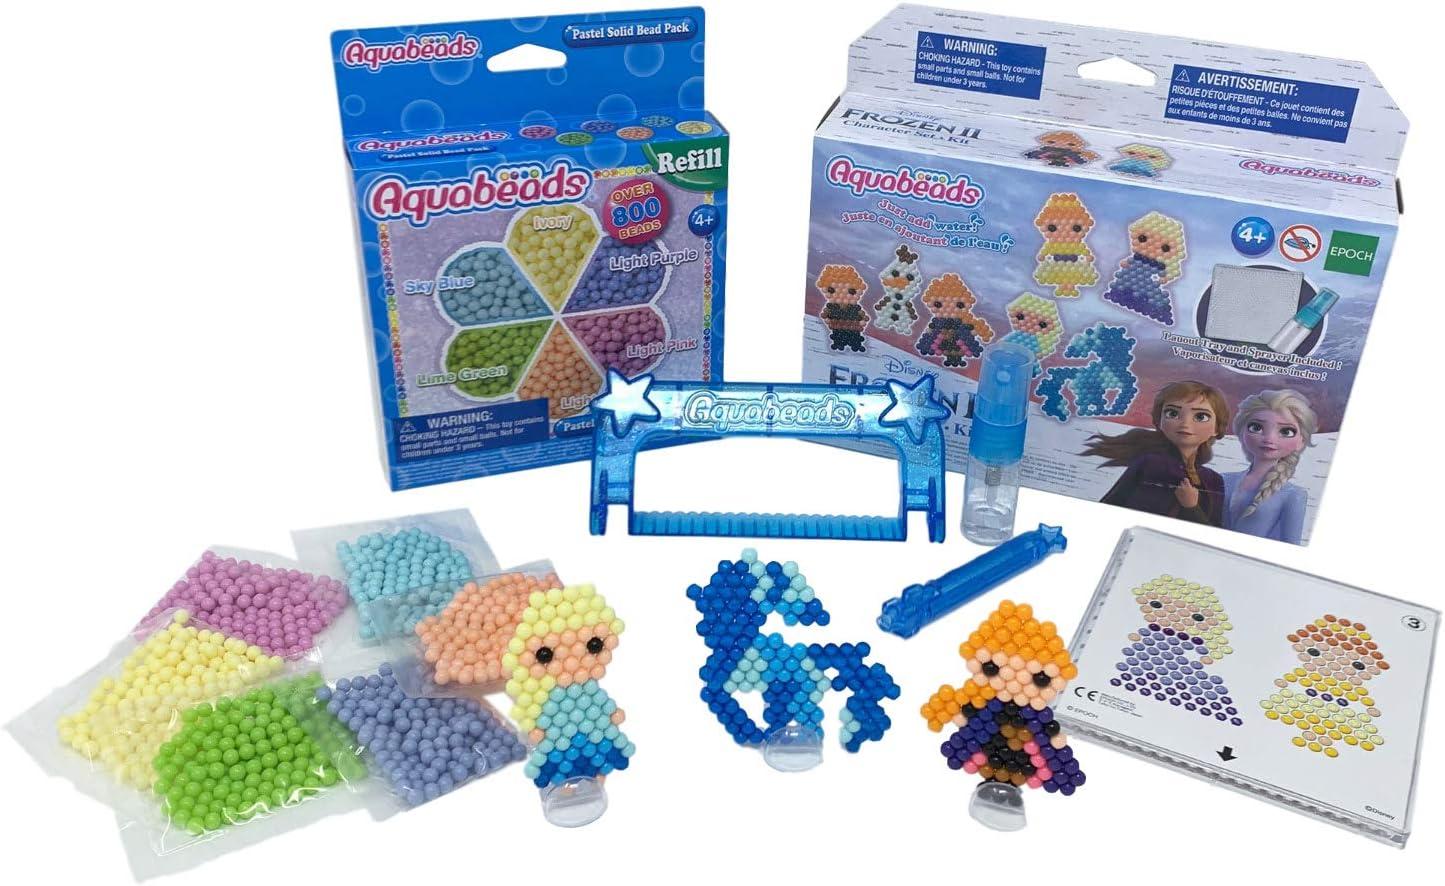 Aquabeads Frozen 2 personajes de Disney Kit/Set con Aqua Beads Pastel Refill, Aquabeads Pen y Aqua Water Beads Peeler.: Amazon.es: Hogar